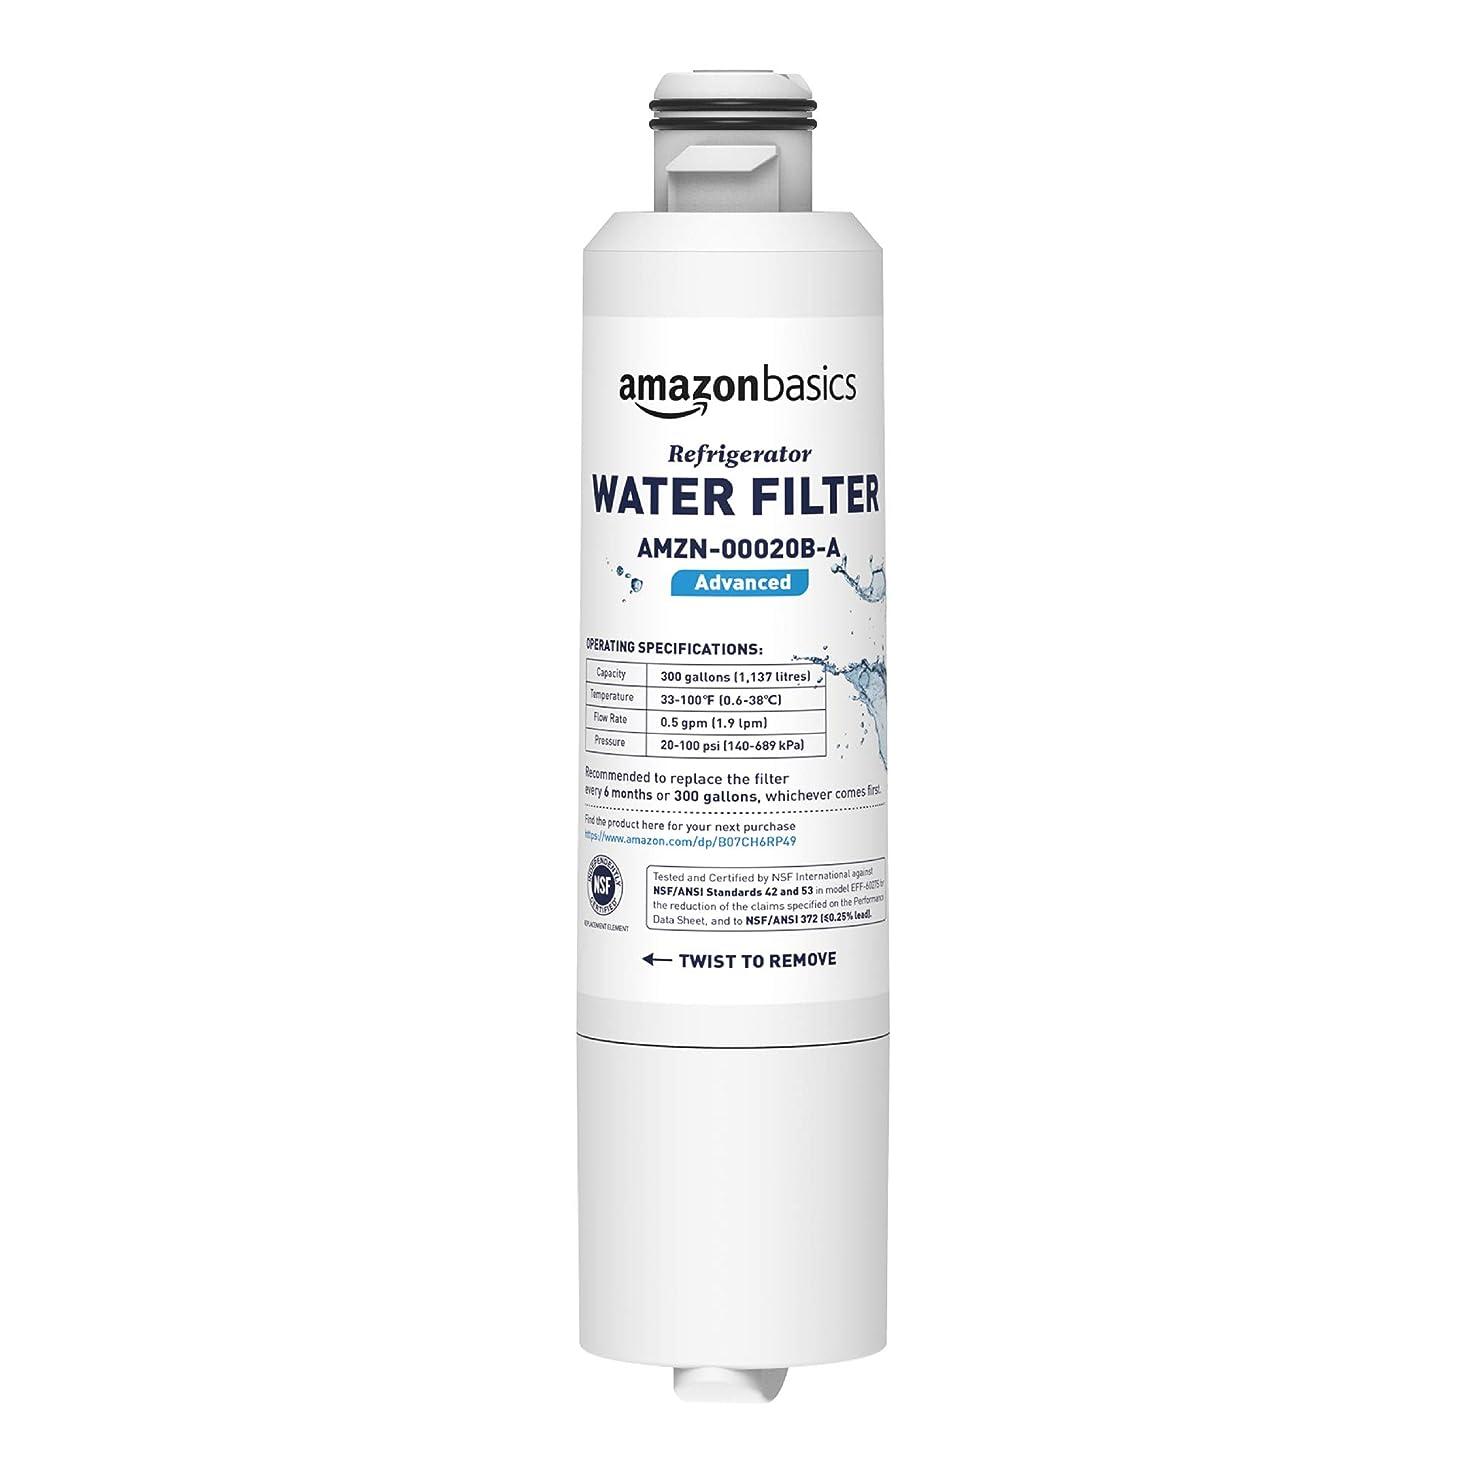 AmazonBasics Replacement Samsung DA29-00020B Refrigerator Water Filter - Advanced Filtration rumprugokdpzv0